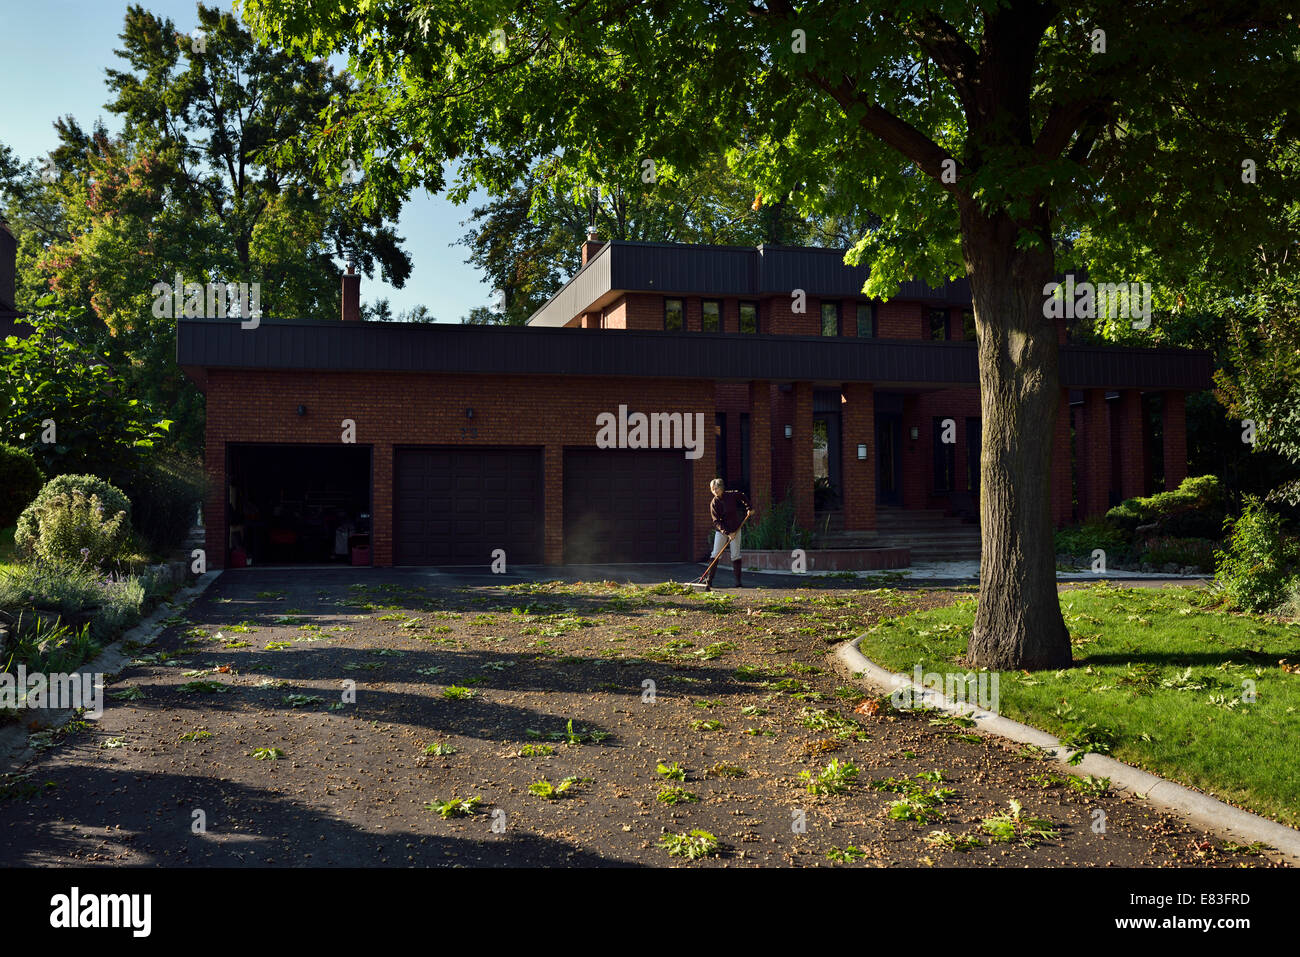 Large Driveway Stockfotos & Large Driveway Bilder - Alamy